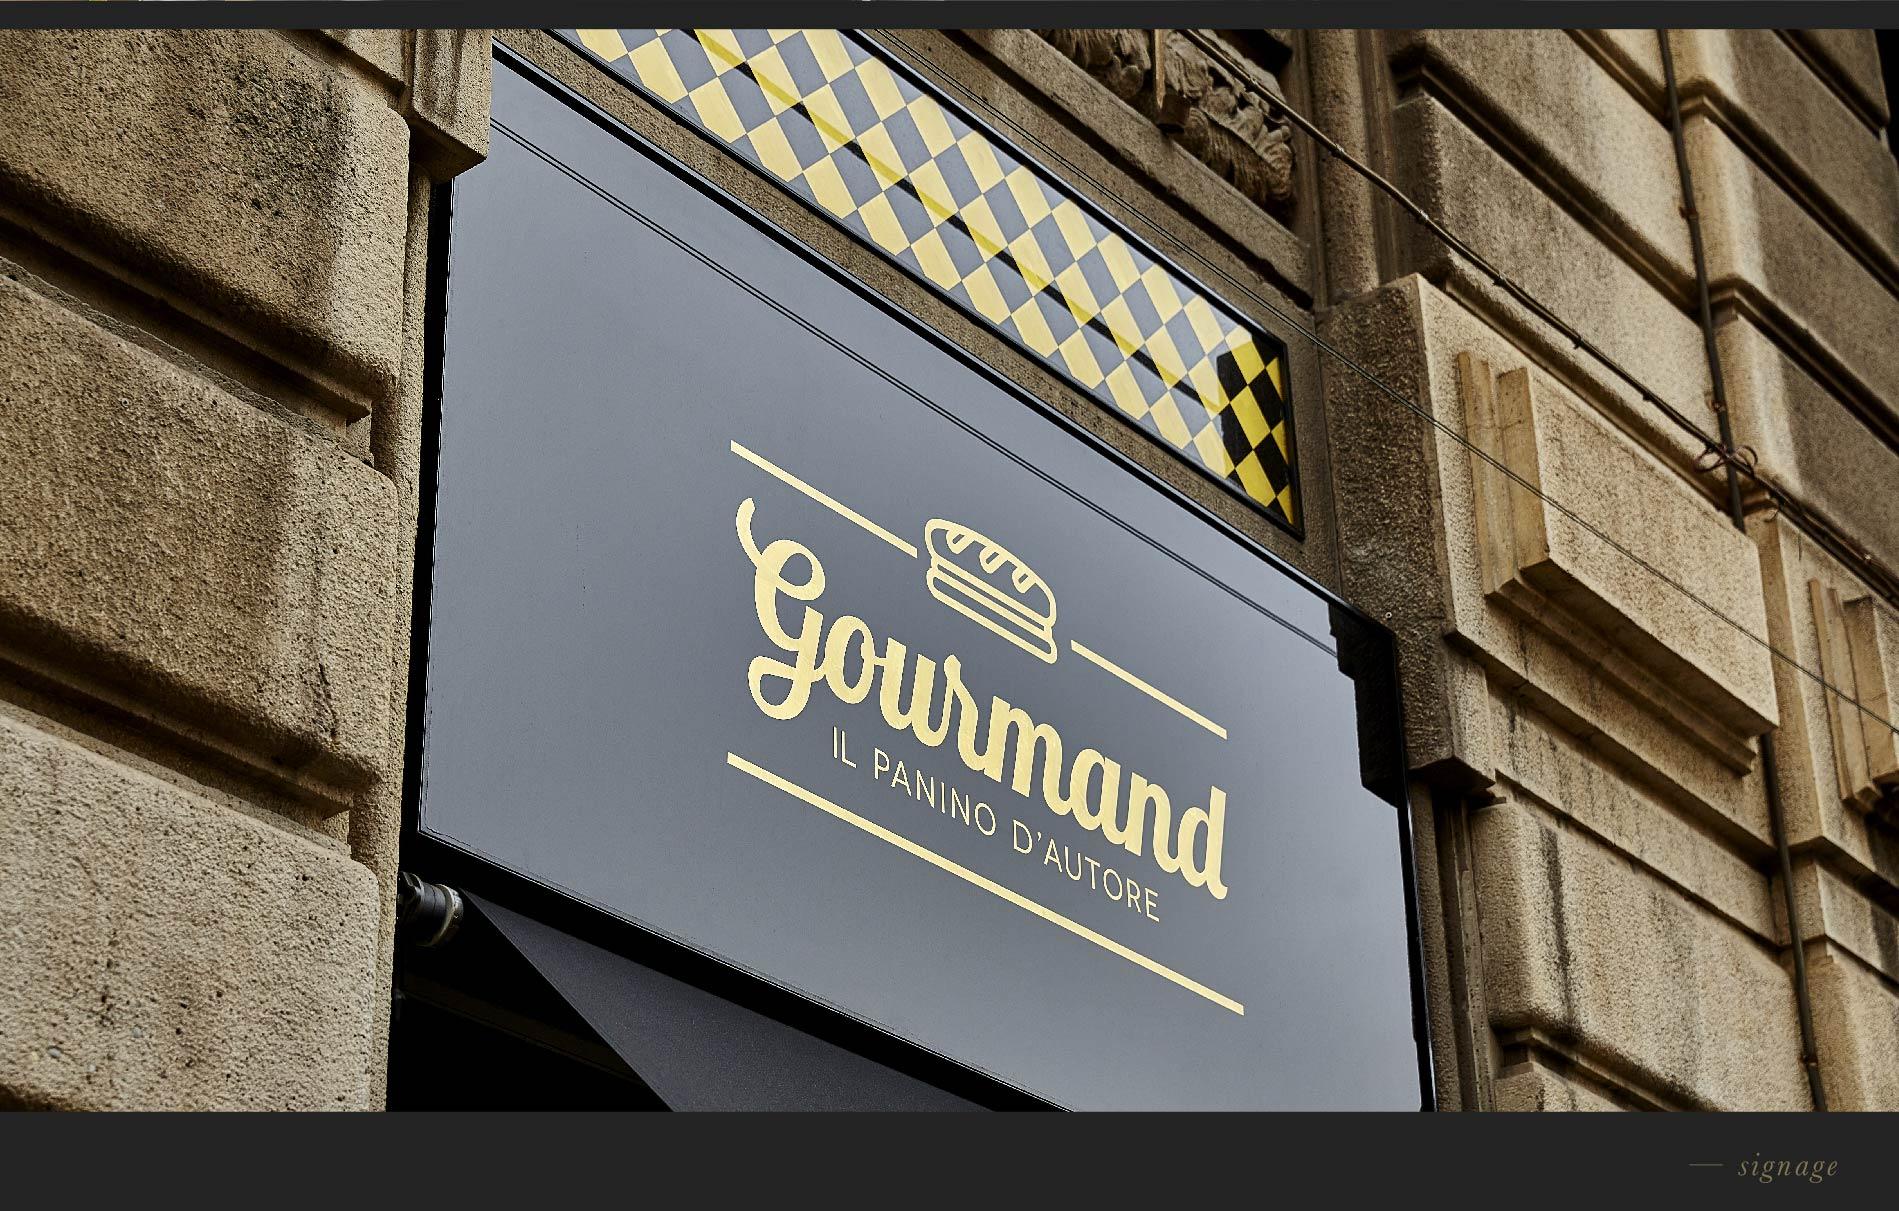 10-Gourmand-panino-autore-signage-gold